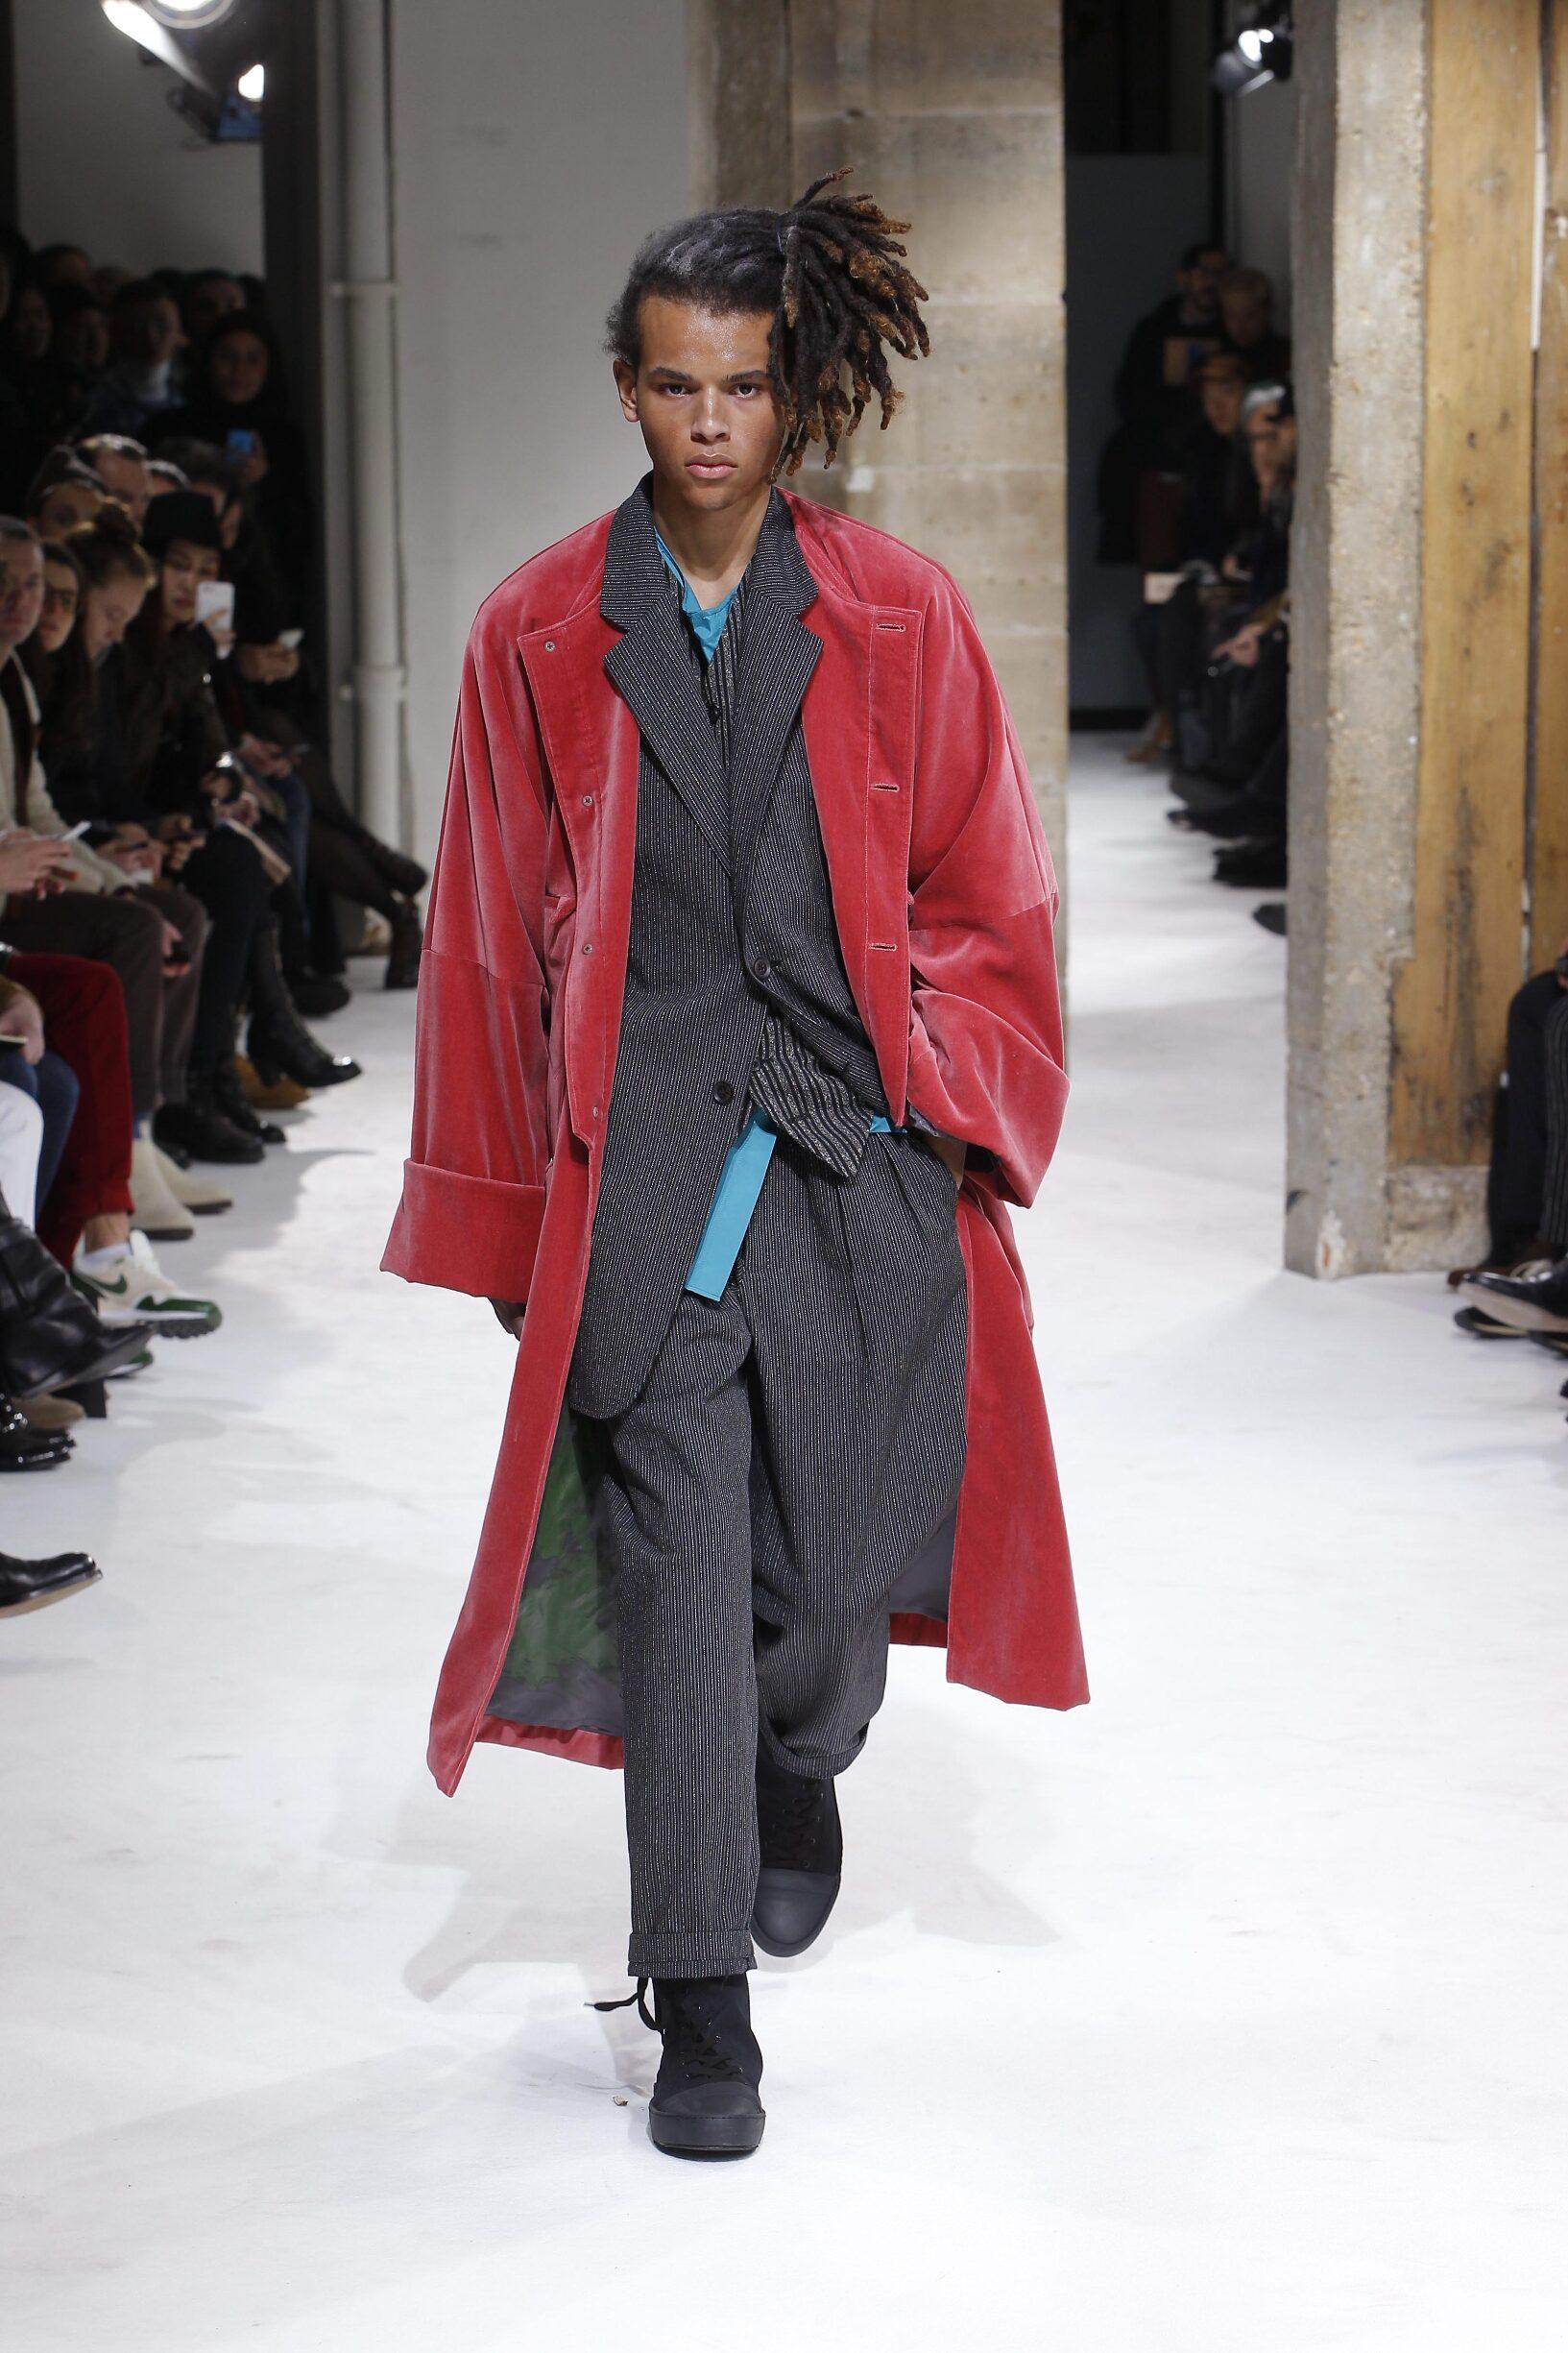 Yohji Yamamoto FW 2017 Menswear